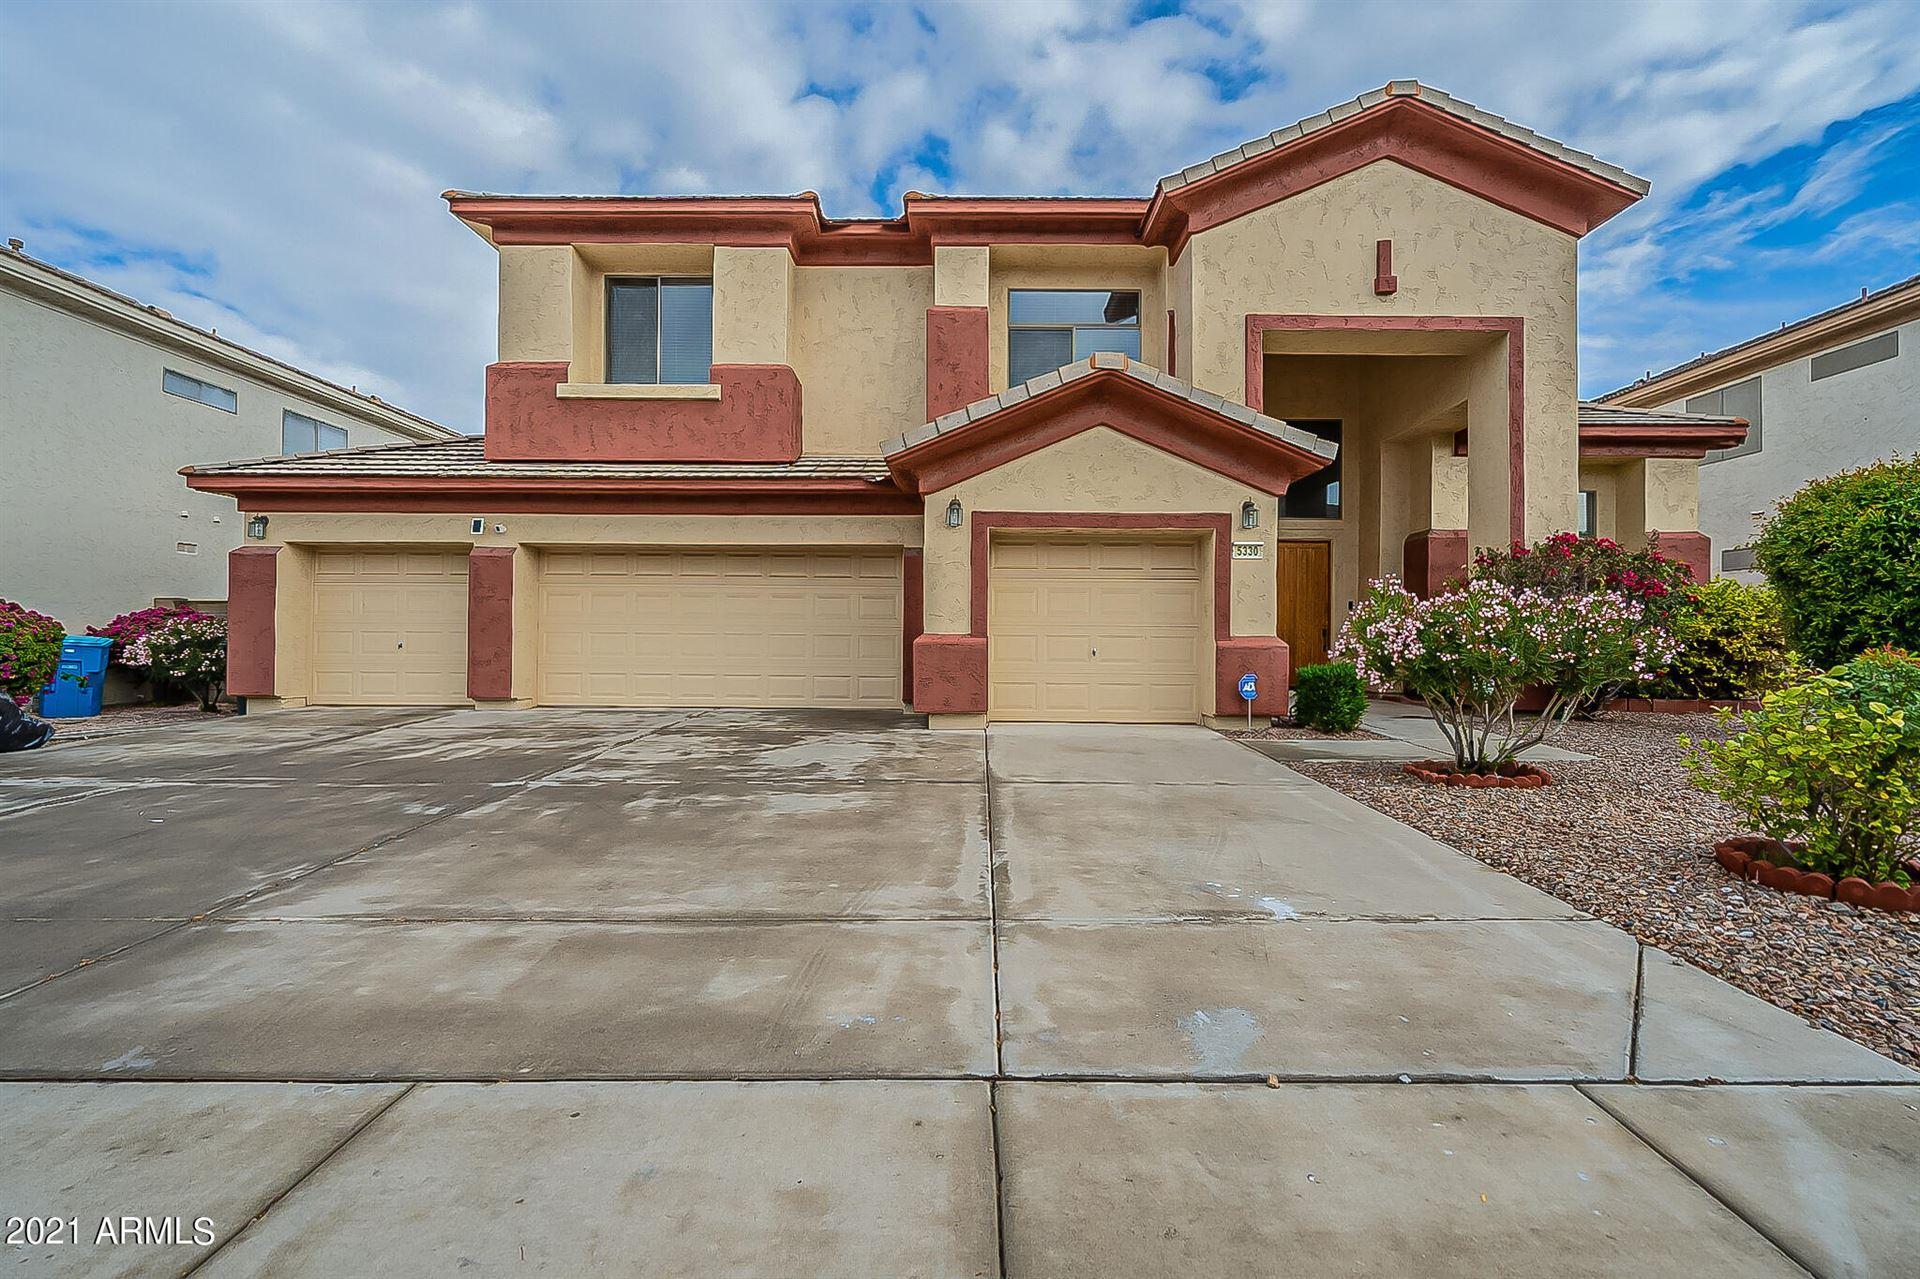 5330 E ANGELA Drive, Scottsdale, AZ 85254 - MLS#: 6203844